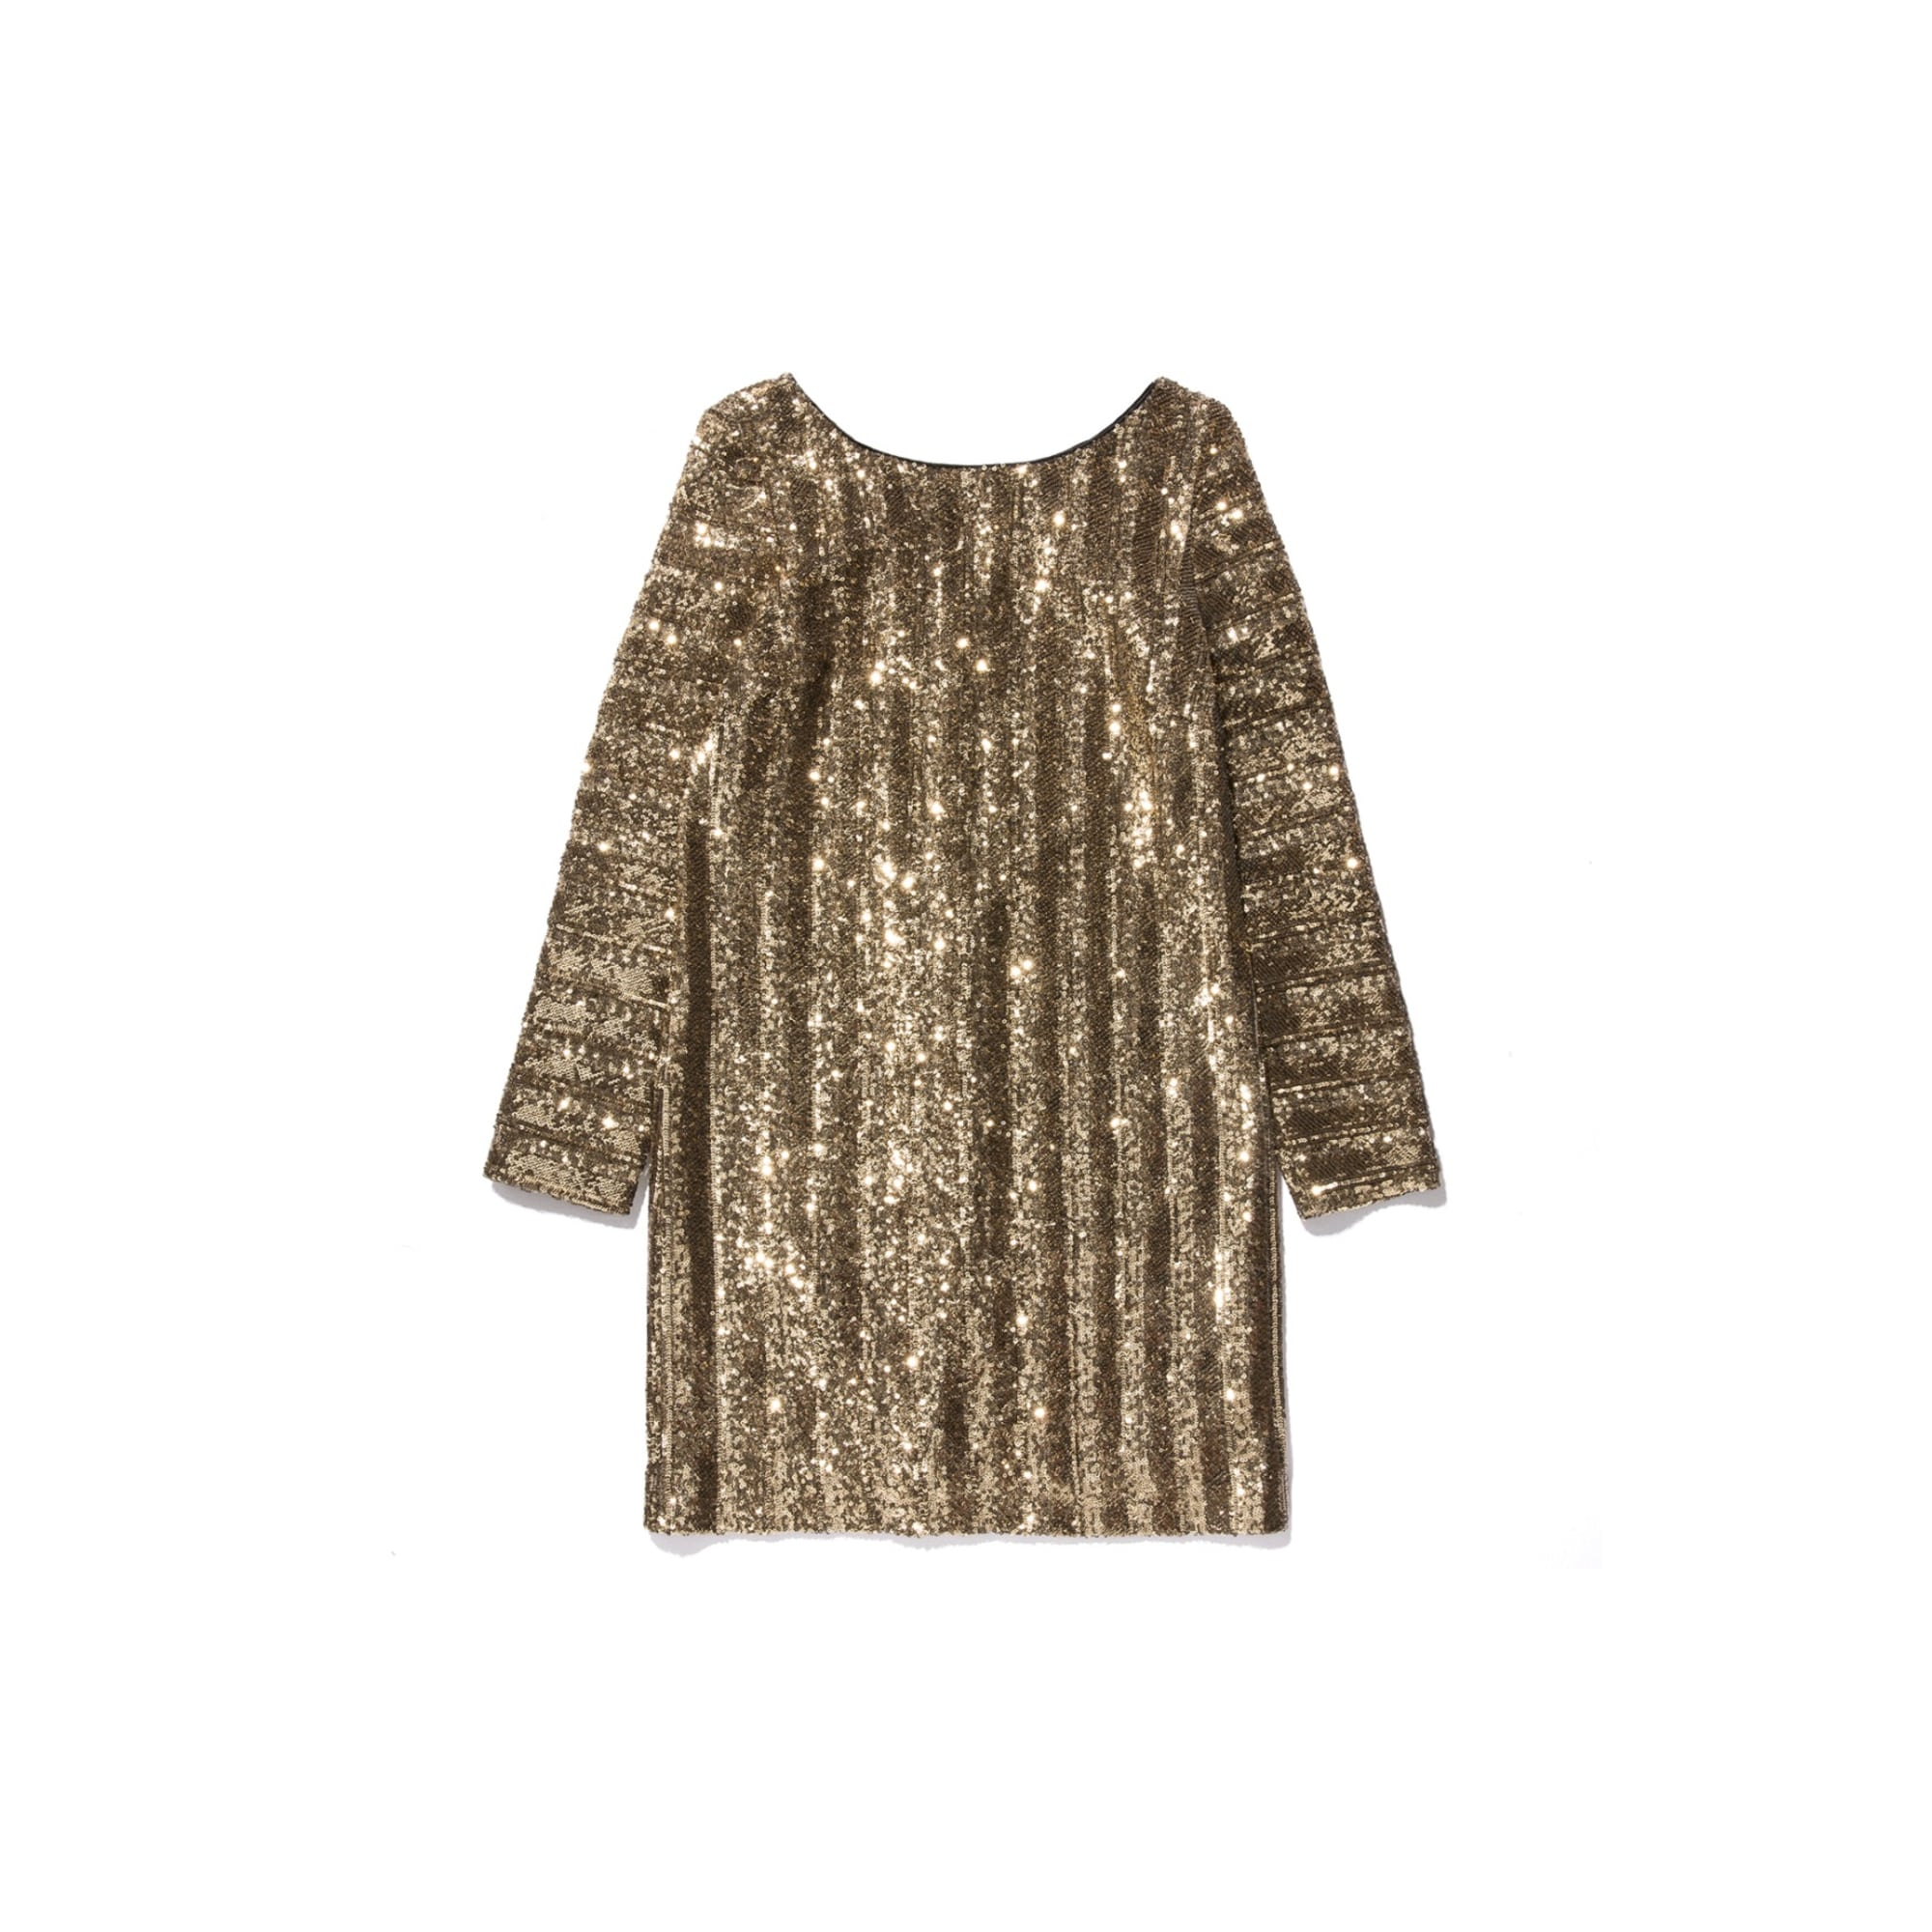 a81b28c50c3 Robe courte BALZAC PARIS 34 (XS